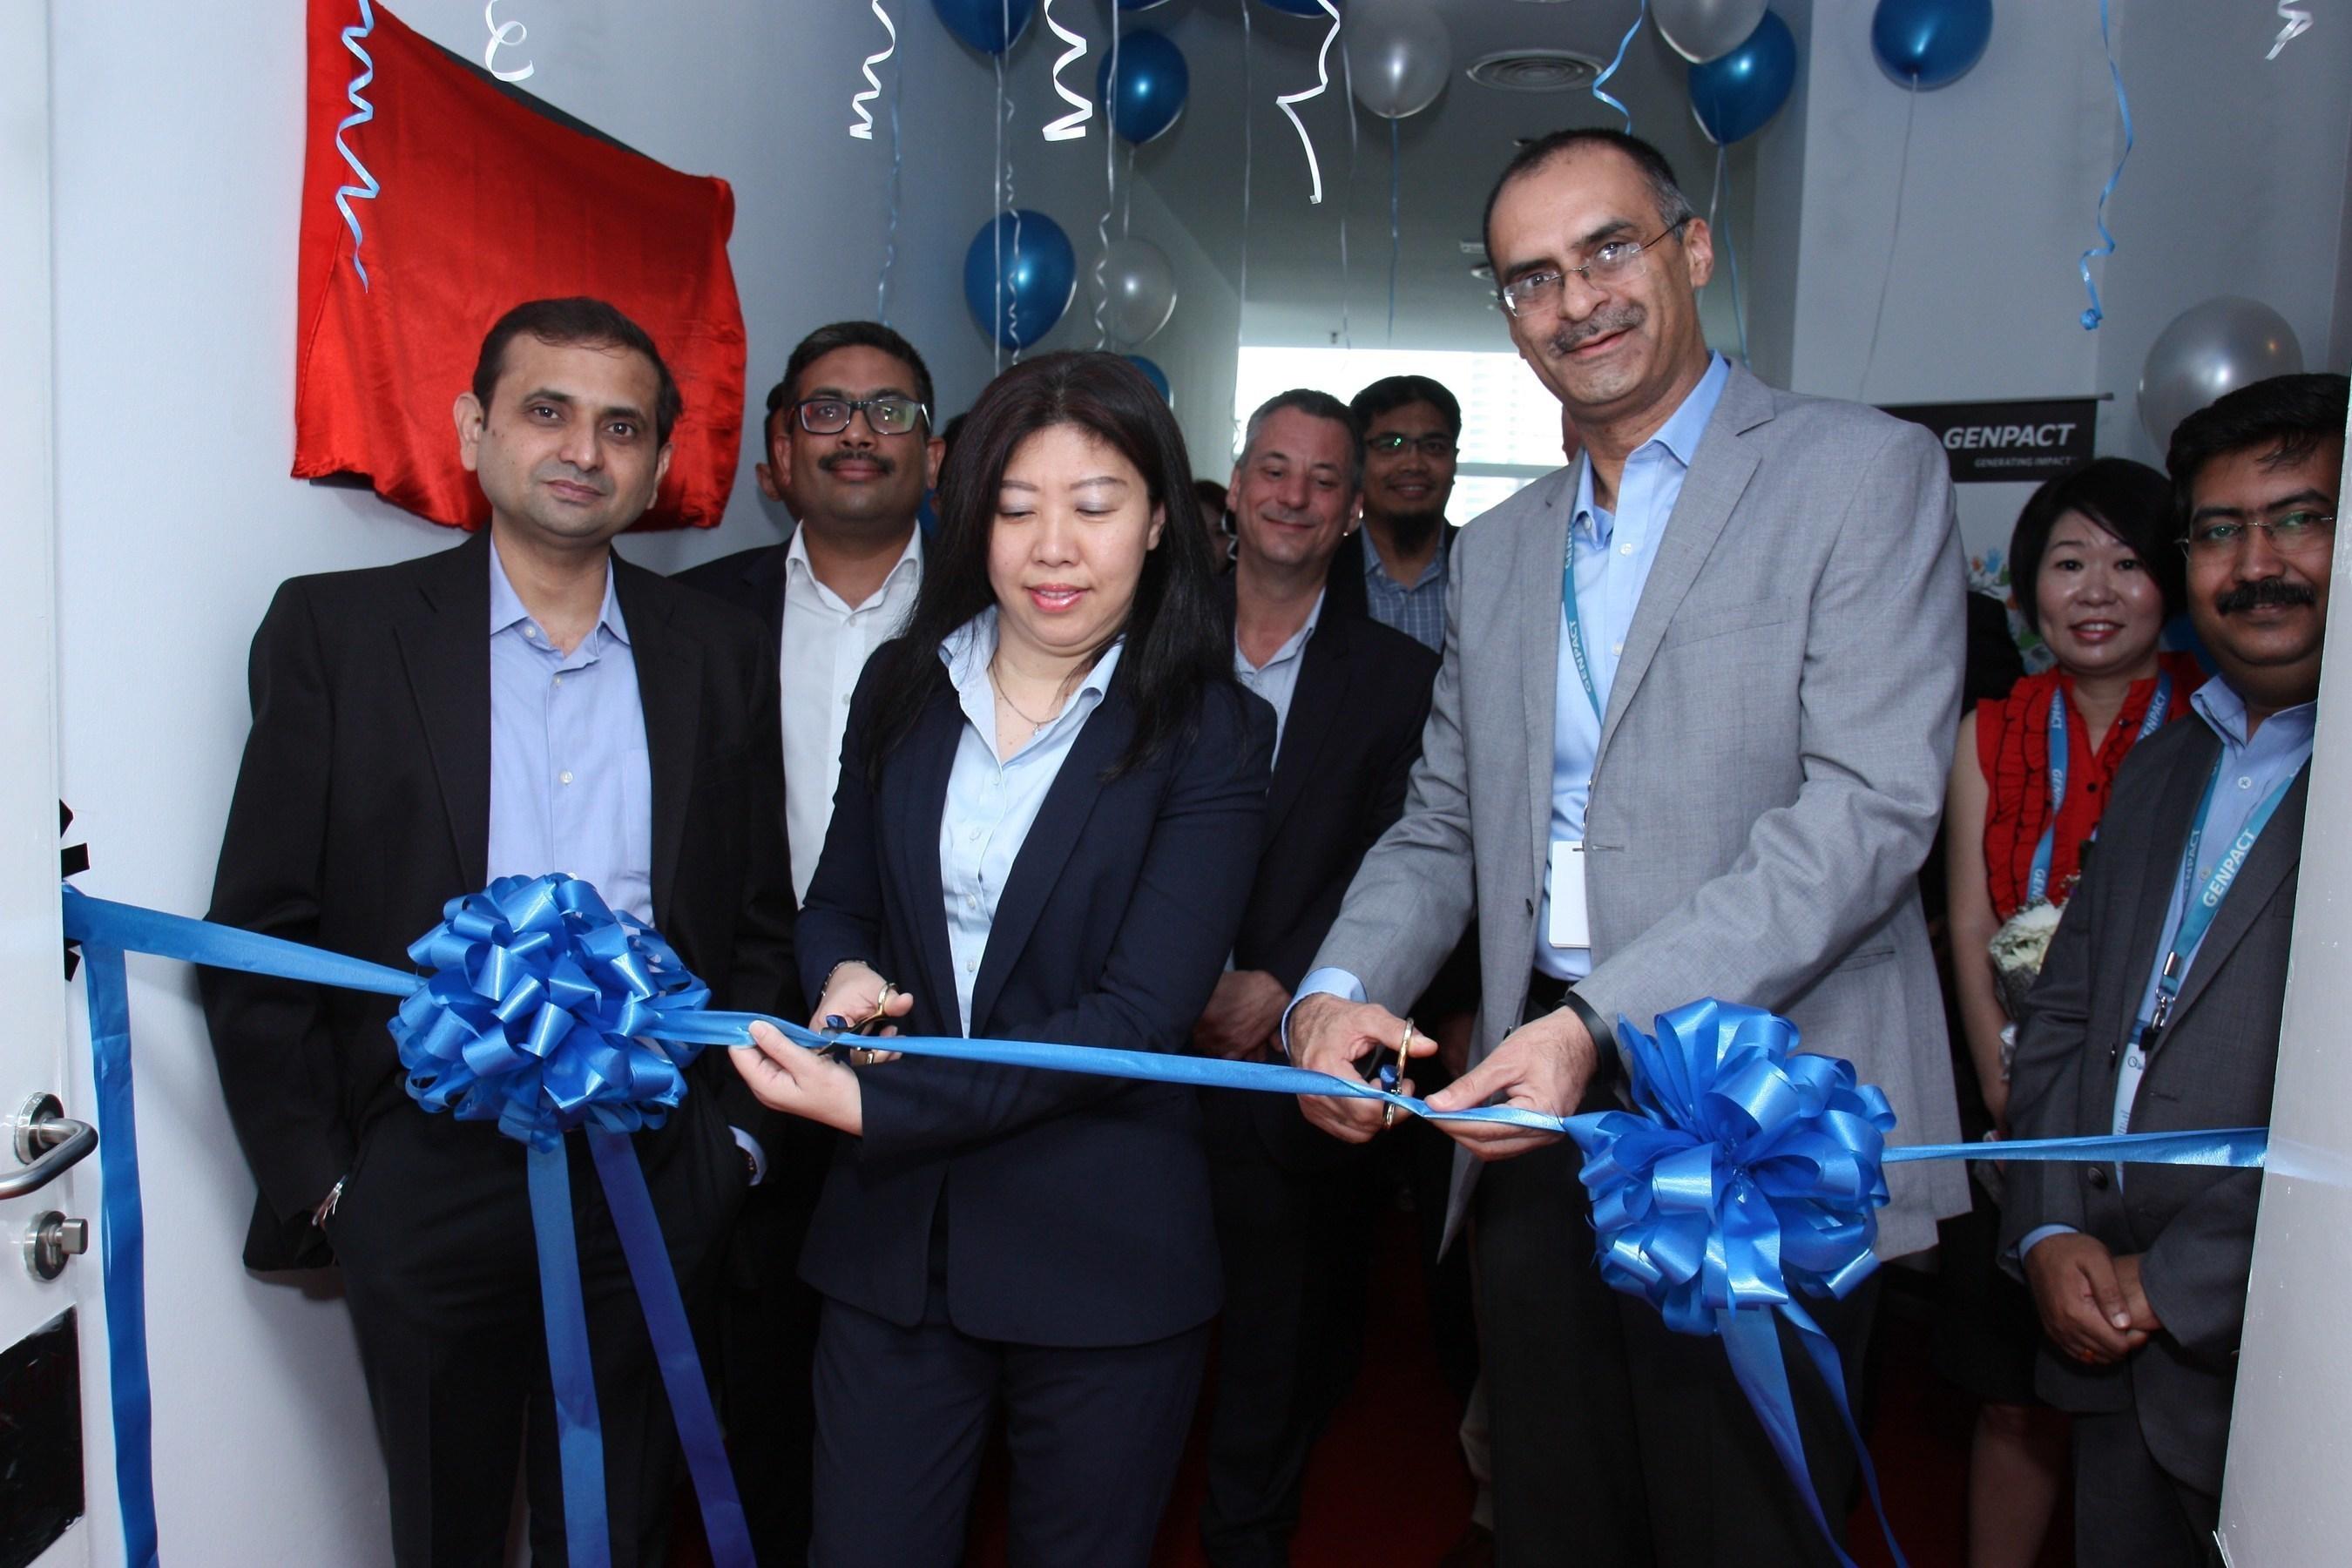 Genpact opens its new Kuala Lumpur, Malaysia center, joined by Ms. Dato Wan Peng, COO of Malaysia Digital Economy Corporation (MDEC).